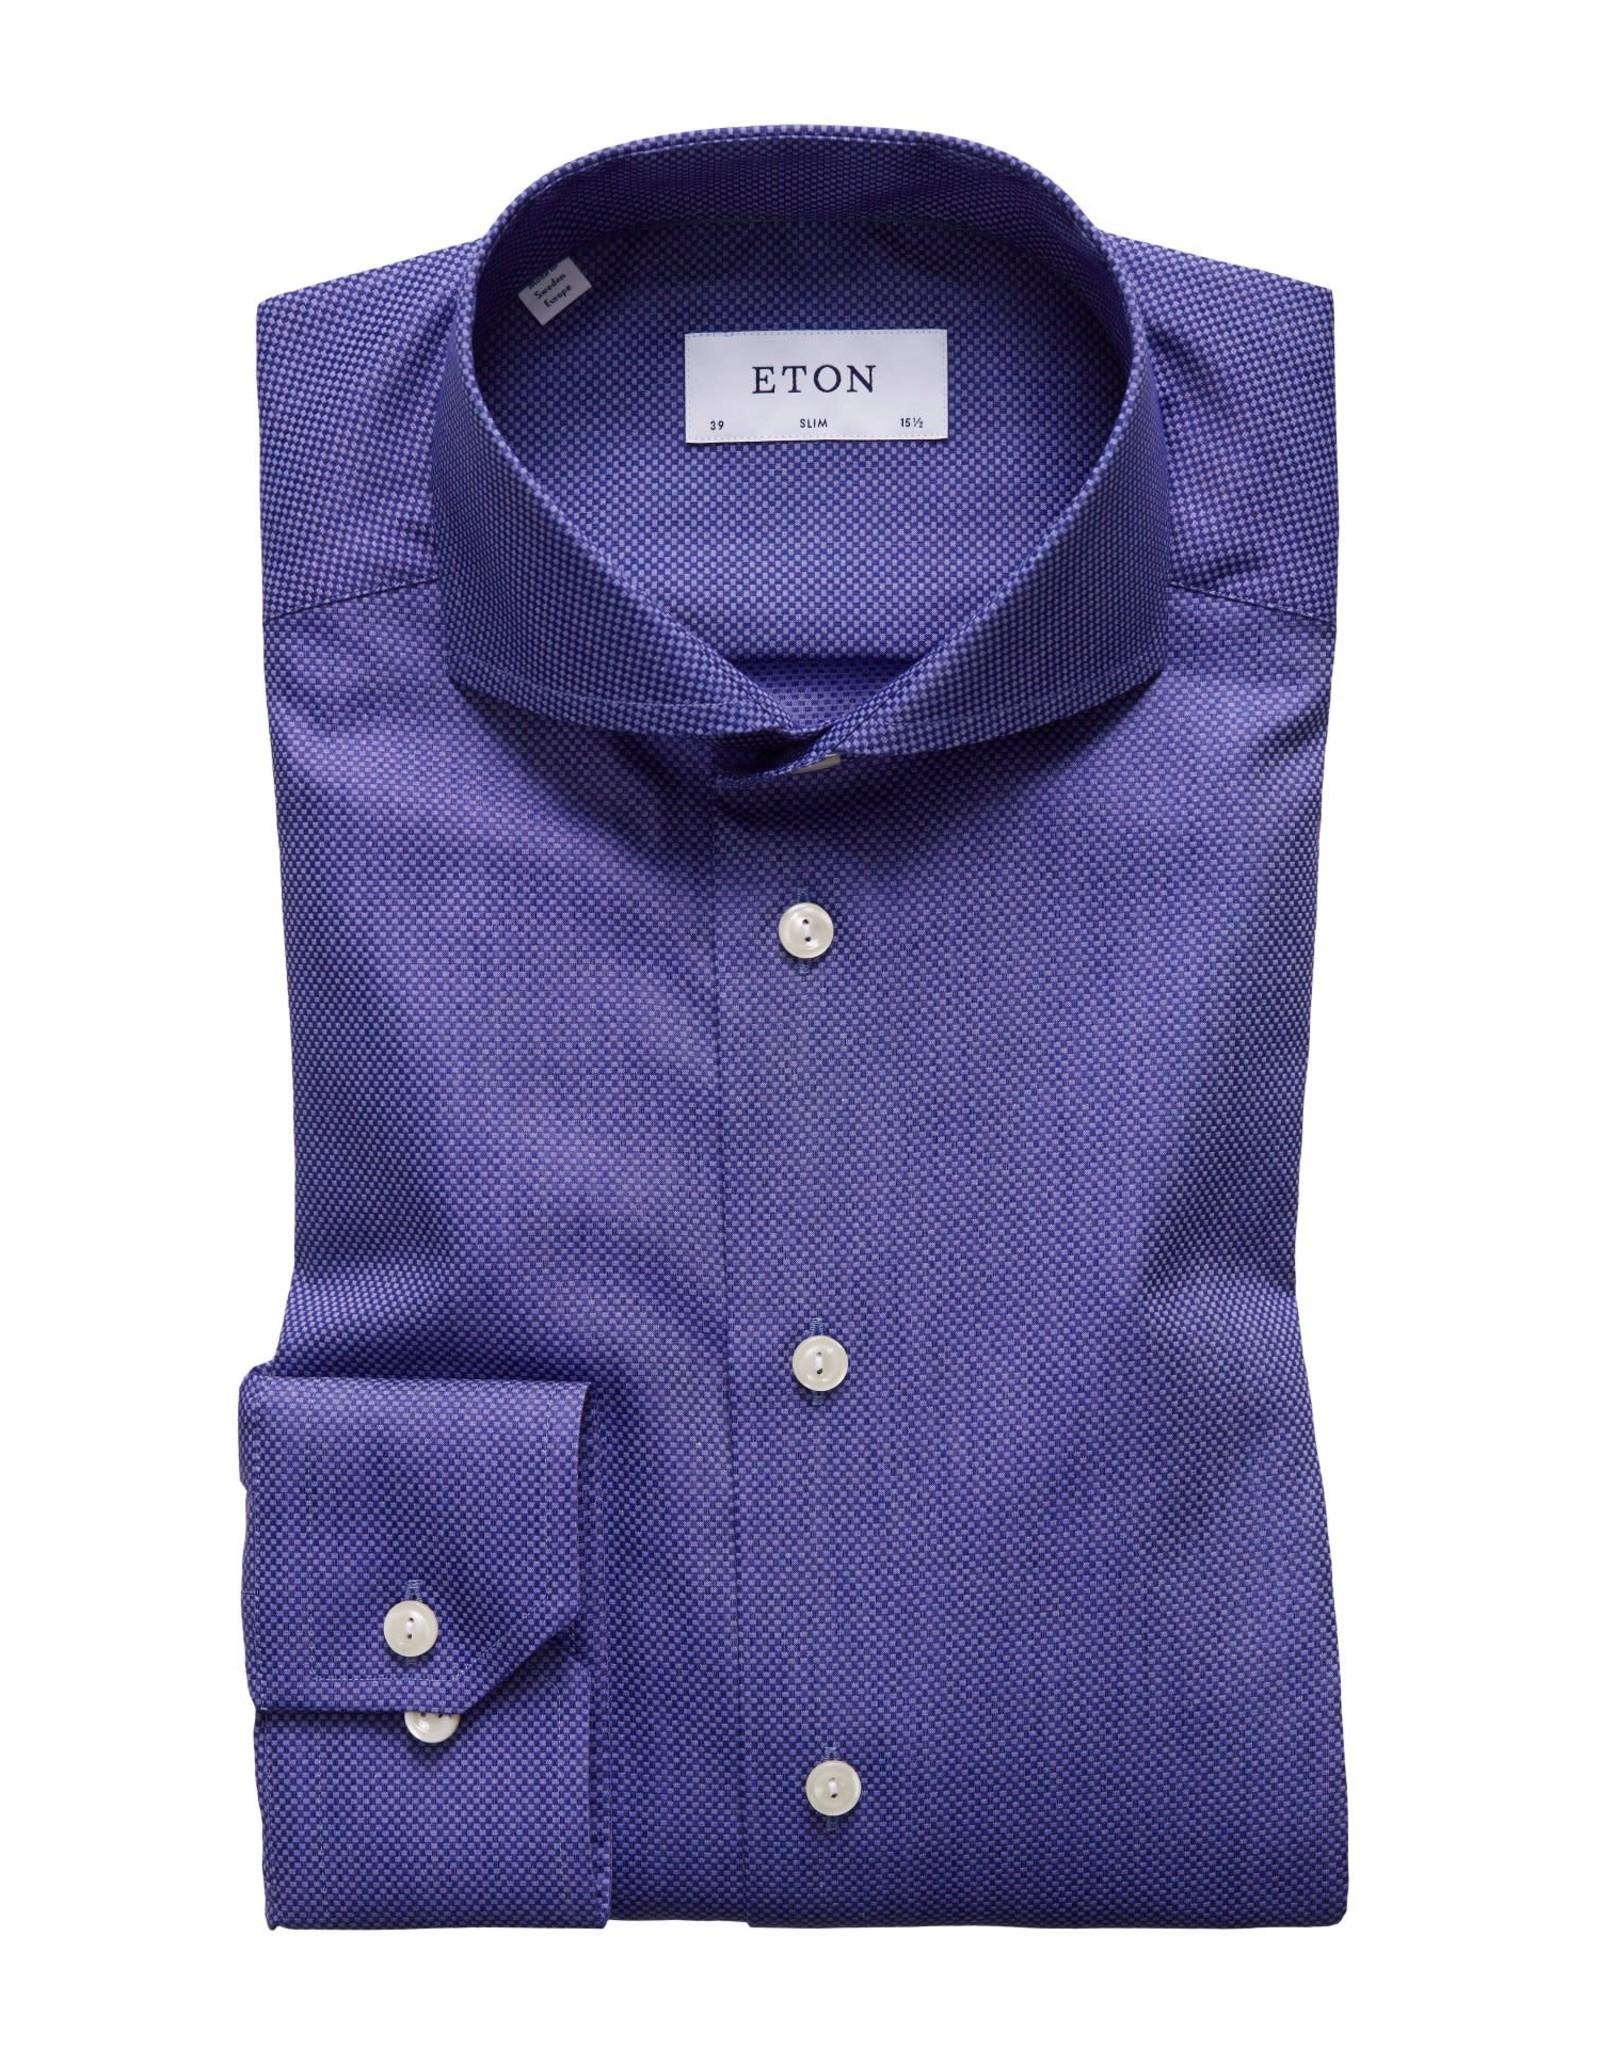 Eton Eton hemd blauw slim 1025-73511/27